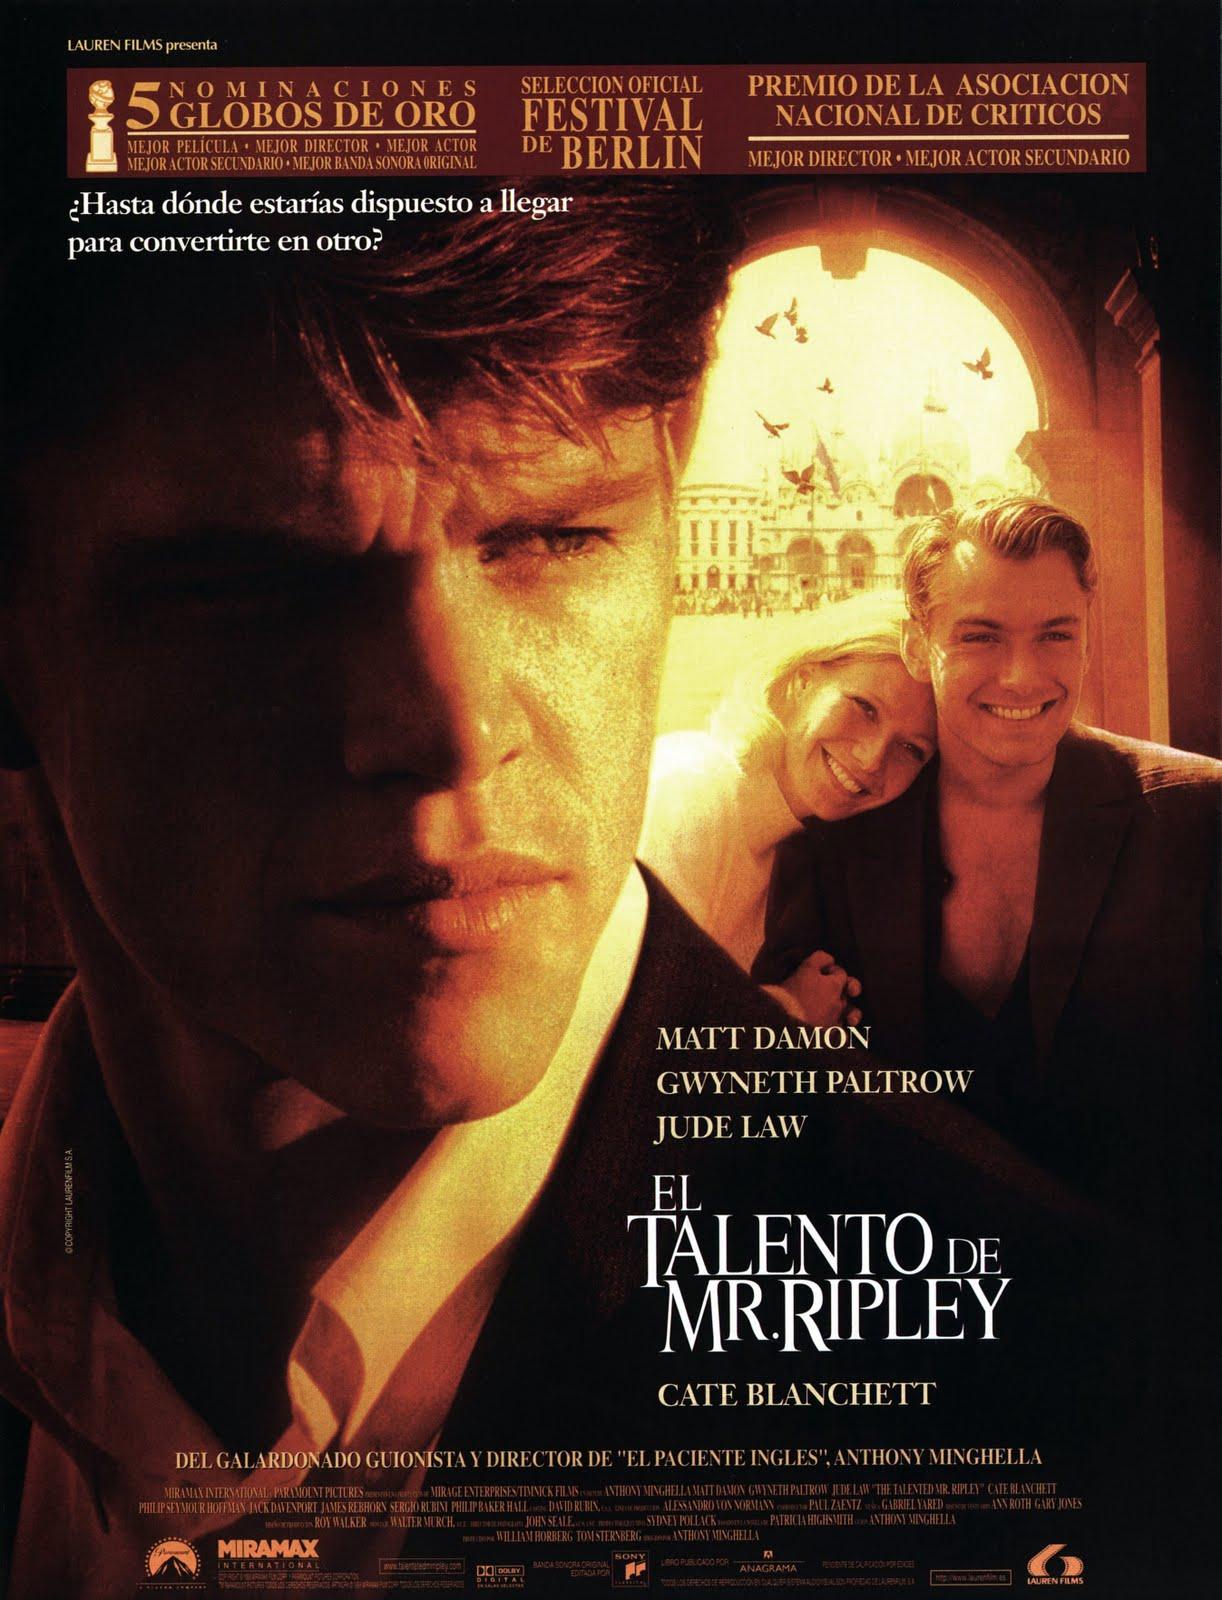 http://3.bp.blogspot.com/_t2NLf0Xf0i4/S8JYOsTEAII/AAAAAAAAFng/tYToFHNSkKA/s1600/1999+-+El+talento+de+Mr.+Ripley+-+The+Talented+Mr.+Ripley+-+tt0134119.jpg